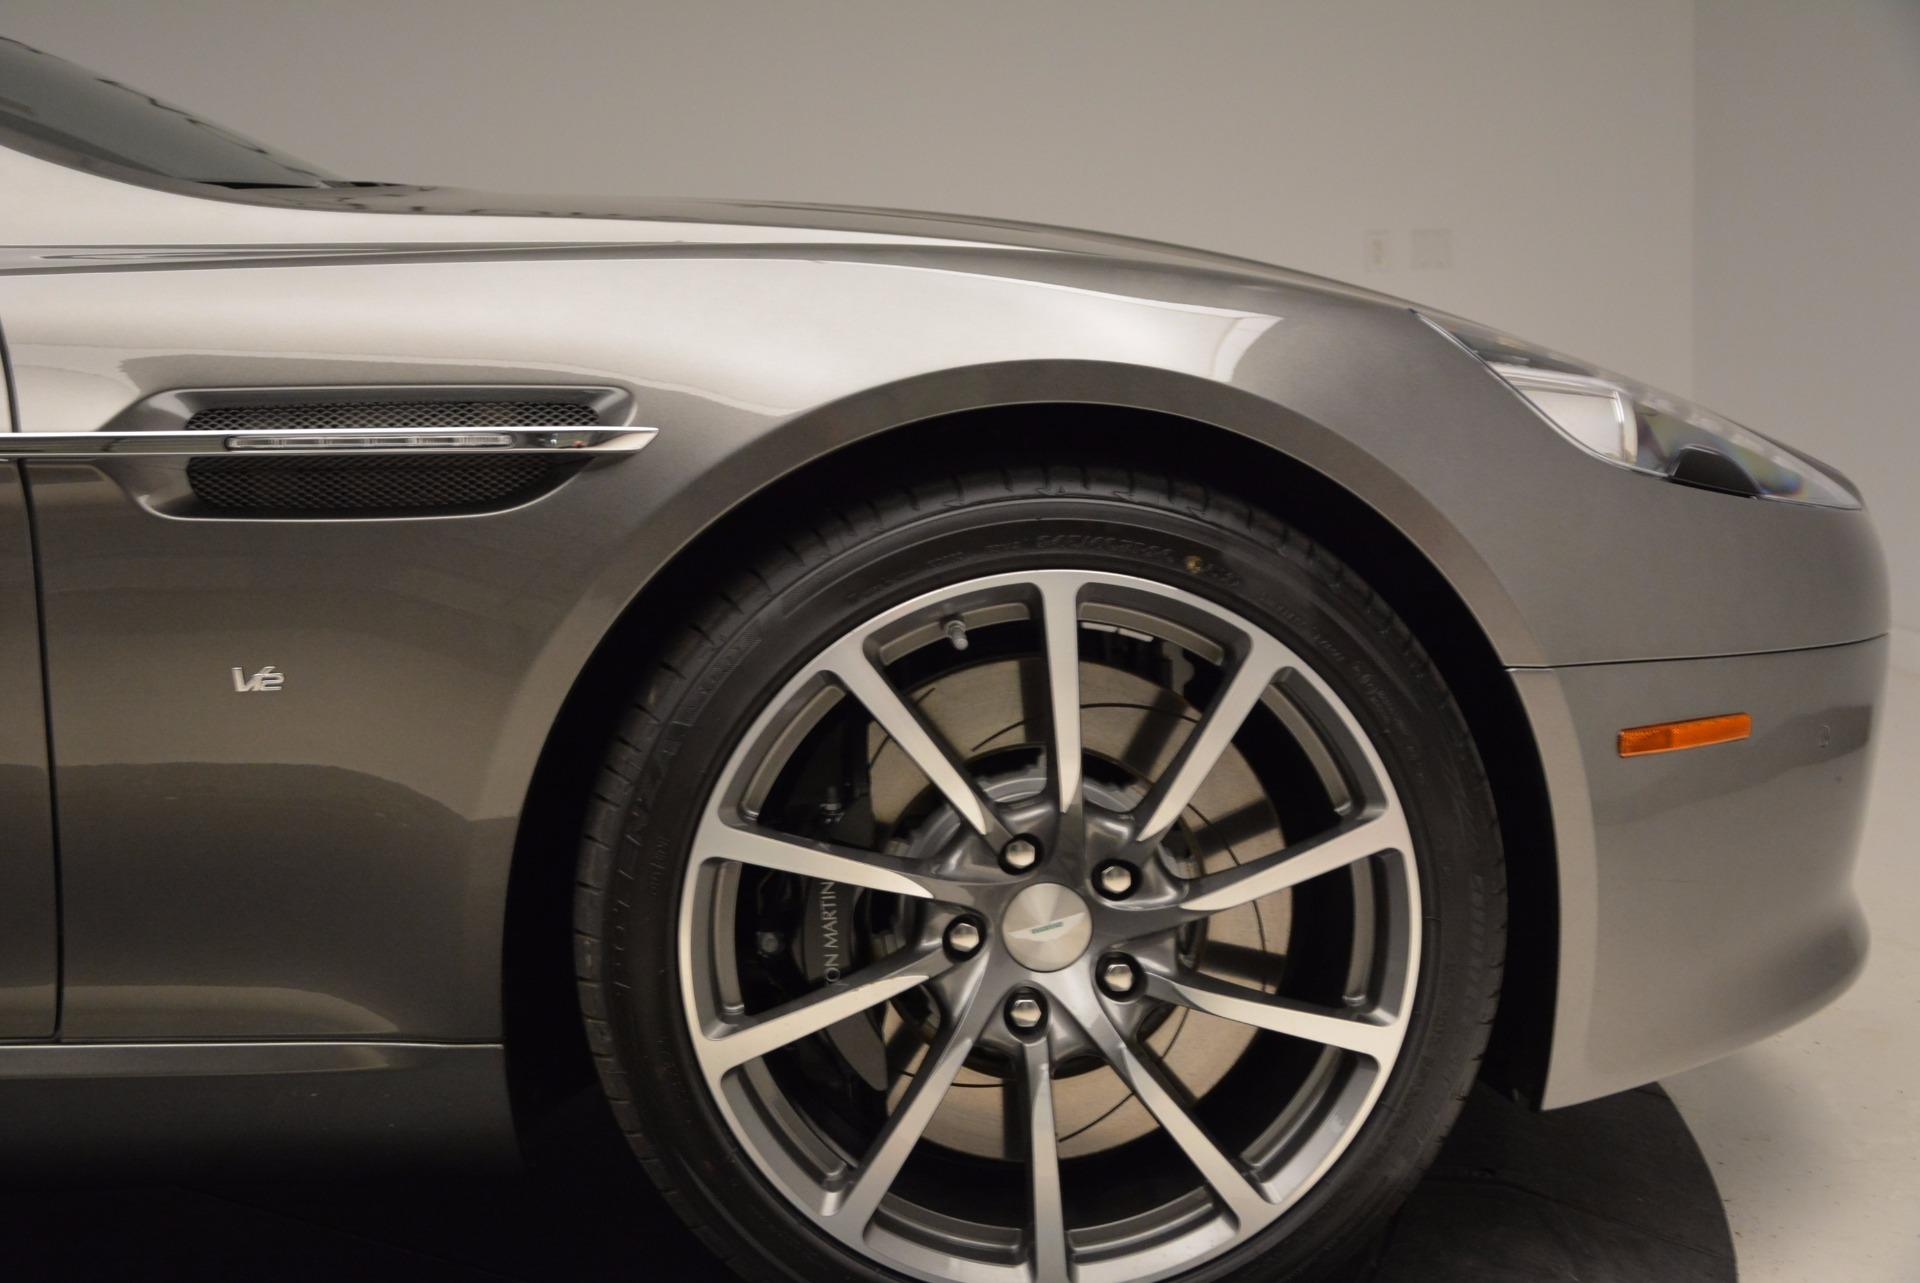 Used 2017 Aston Martin Rapide S Sedan For Sale In Greenwich, CT 1843_p22